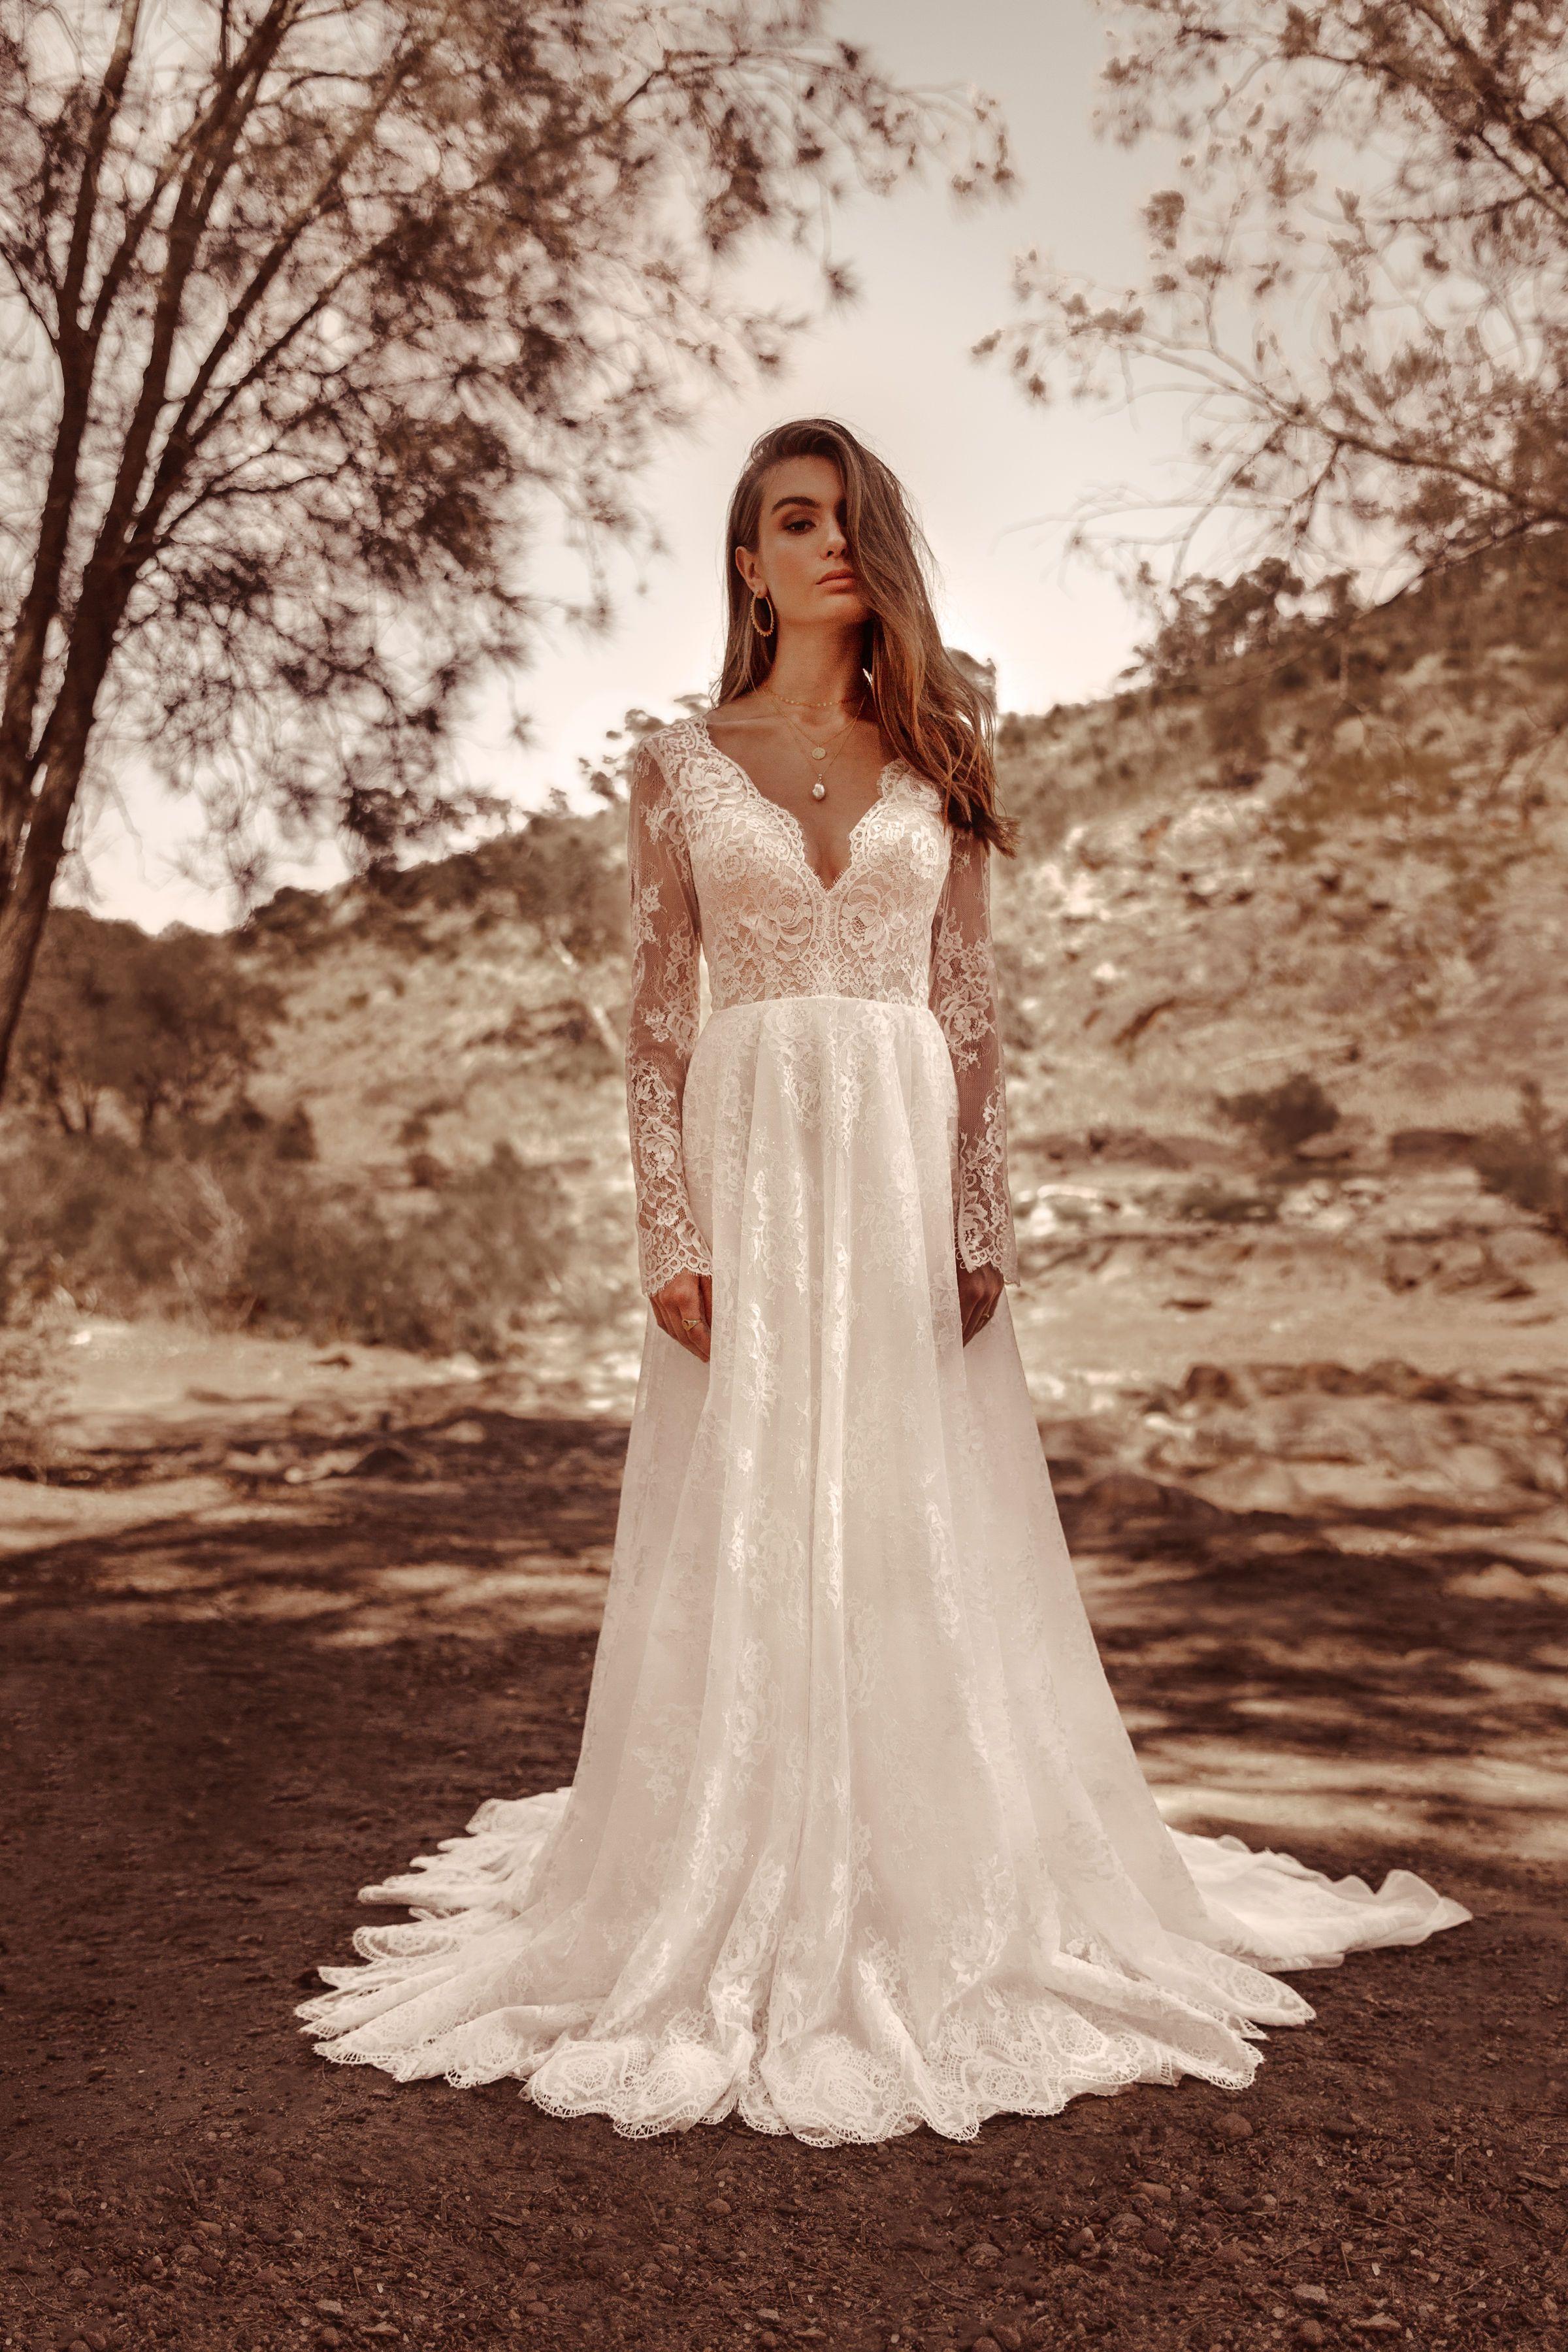 Beautiful BOHO wedding dress from White April Bridal